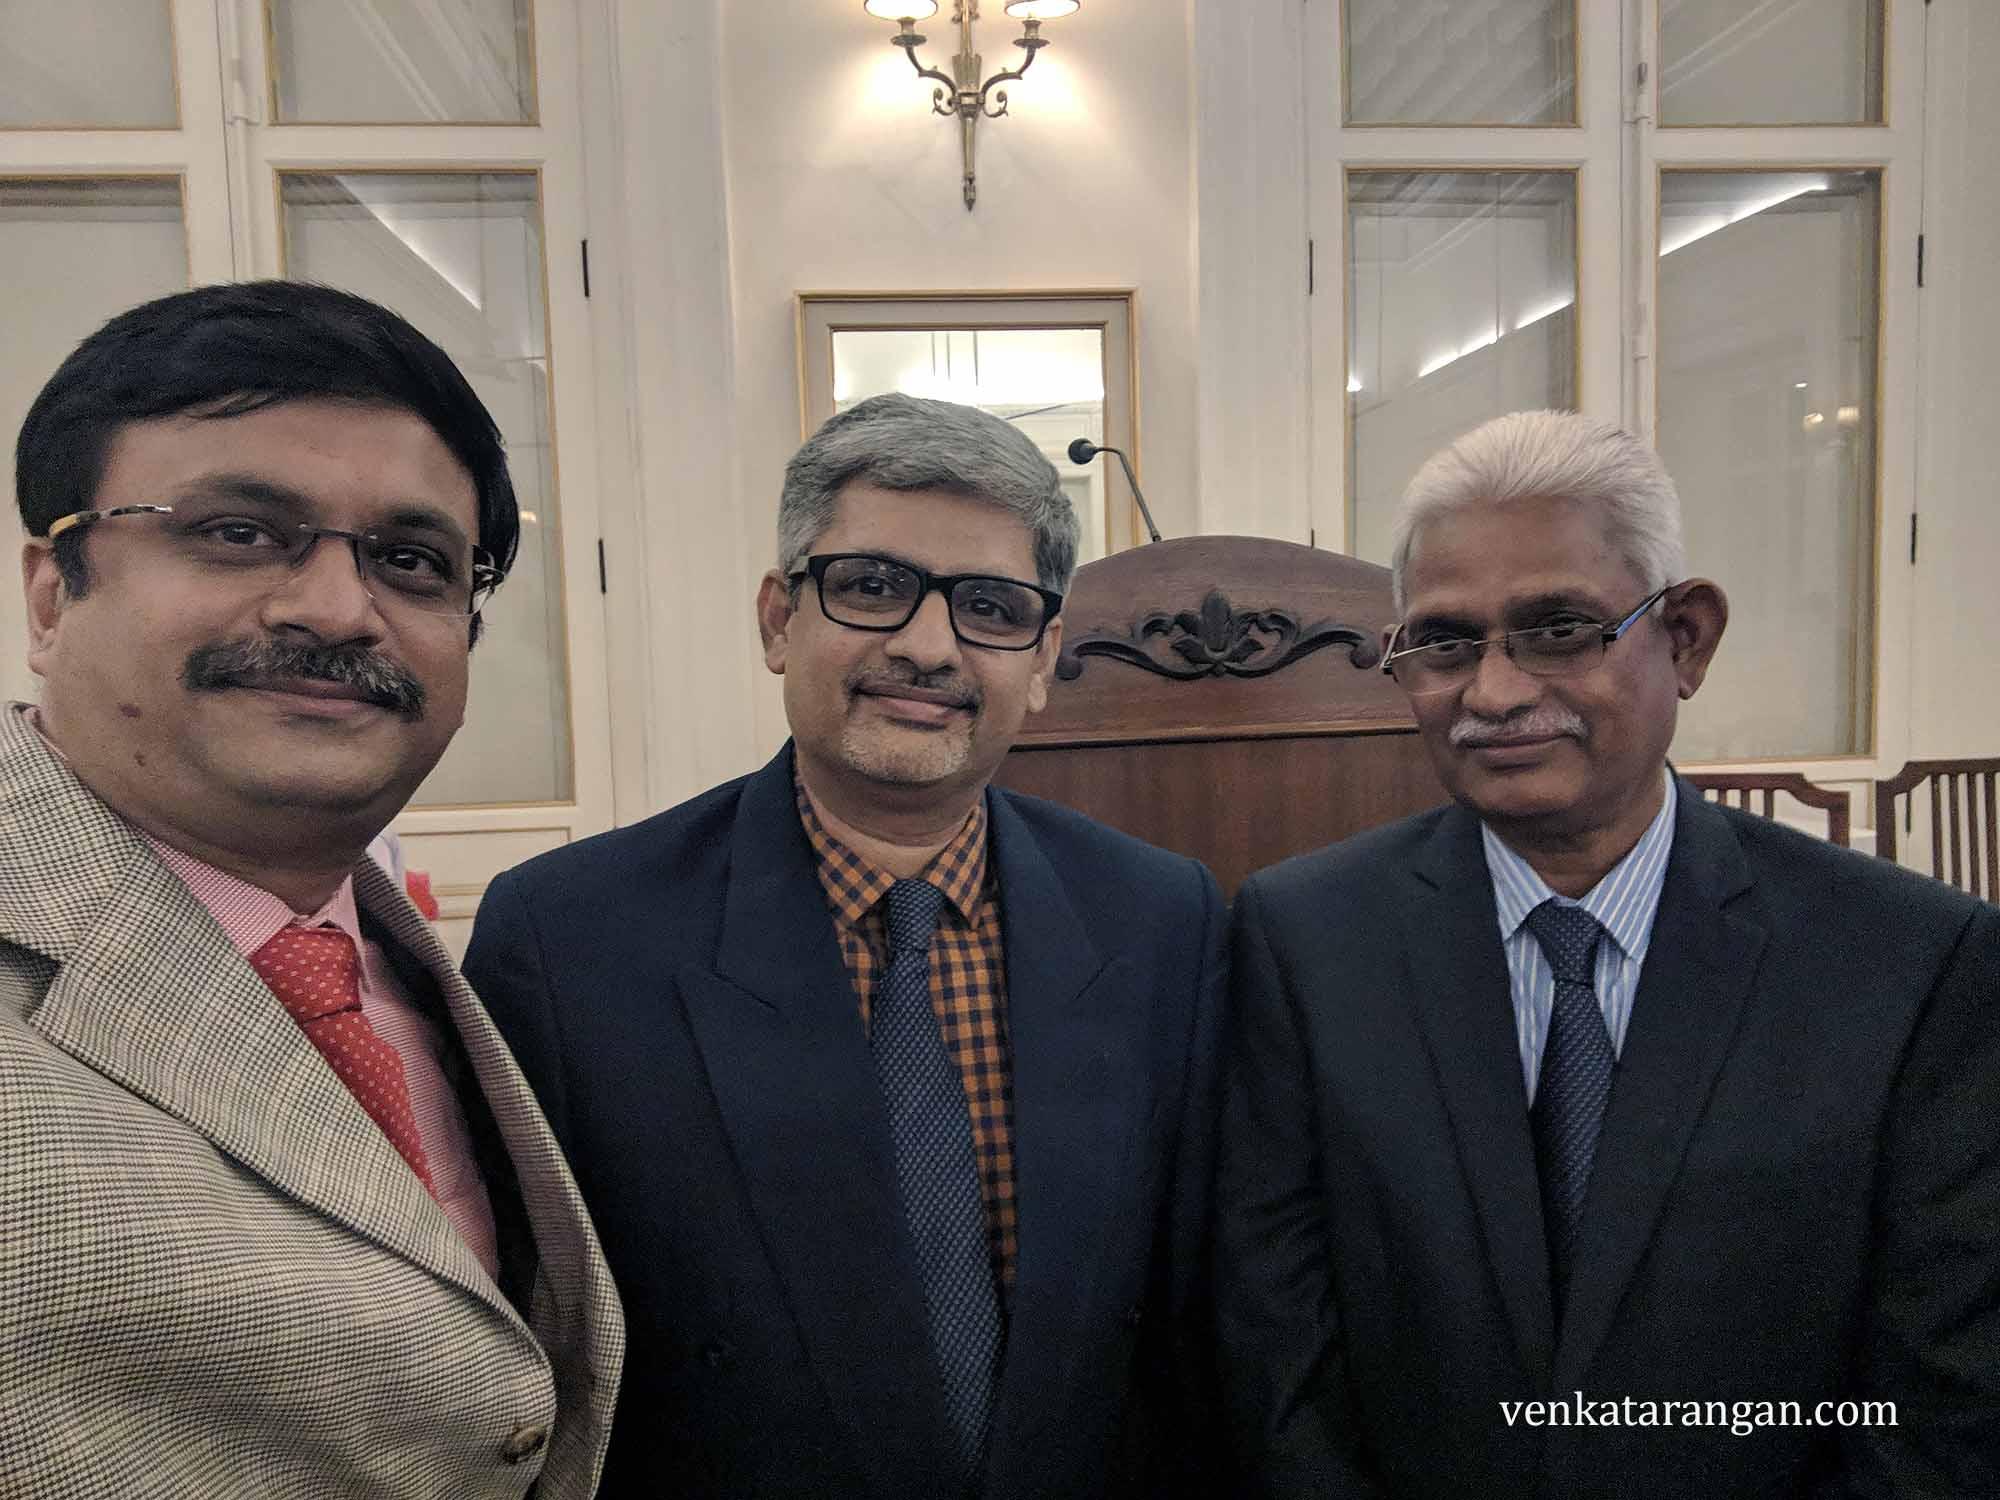 Prof Ganesh Vaidyanathan S (Principal of Sri Venkateswara College of Engineering, Sriperumbudur and my alma mater) and Dr M Sivanandham (Secretary of SVCE)